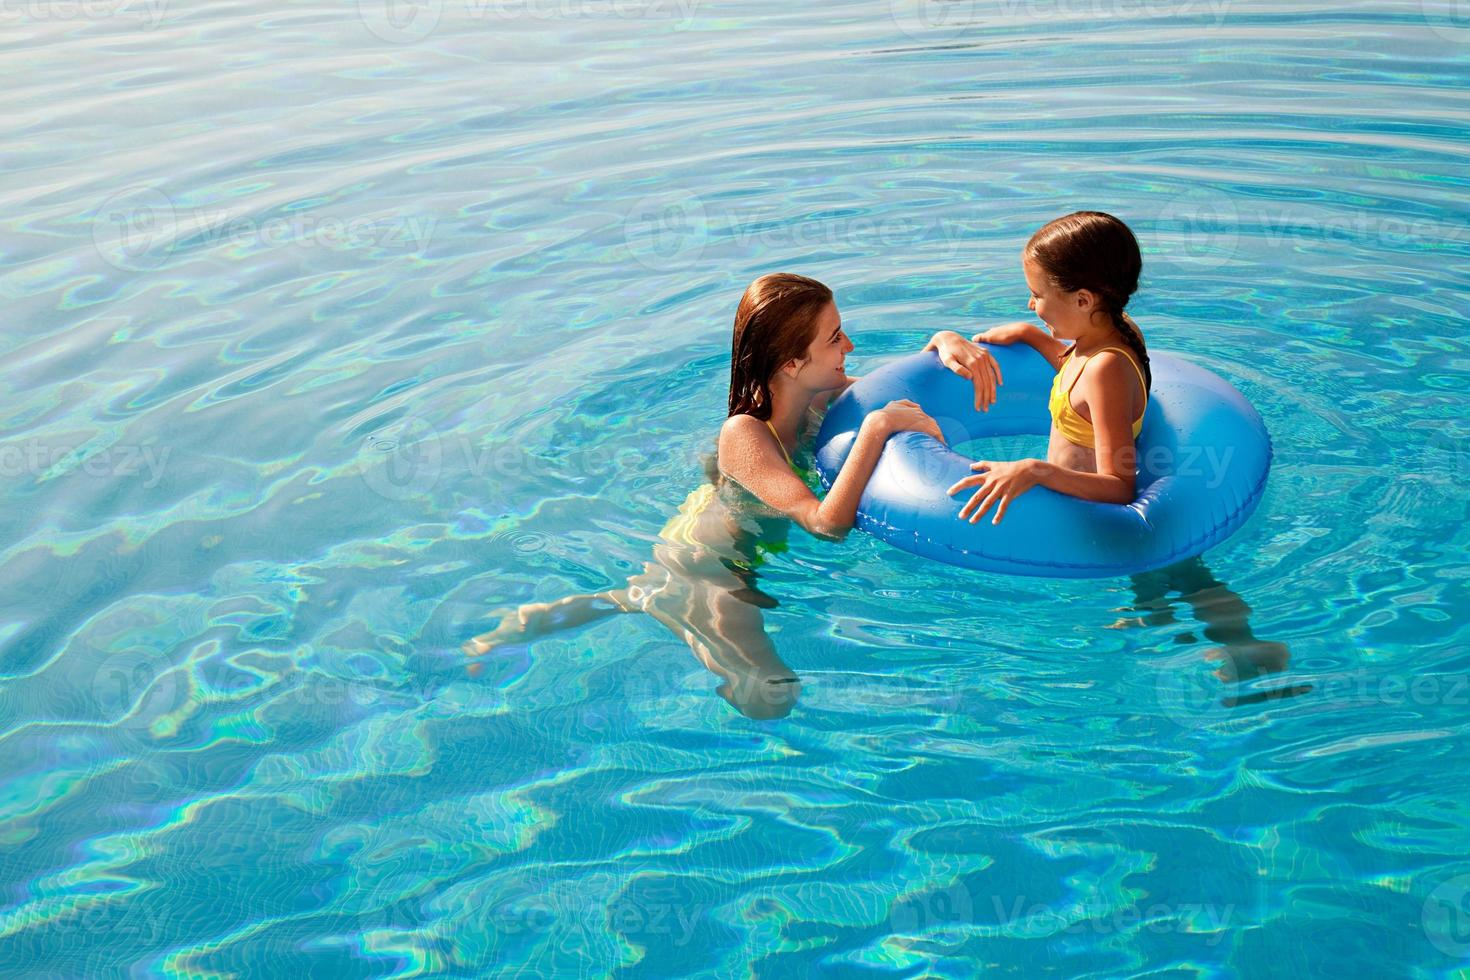 meisjes met in opblaasbare ring in zwembad foto